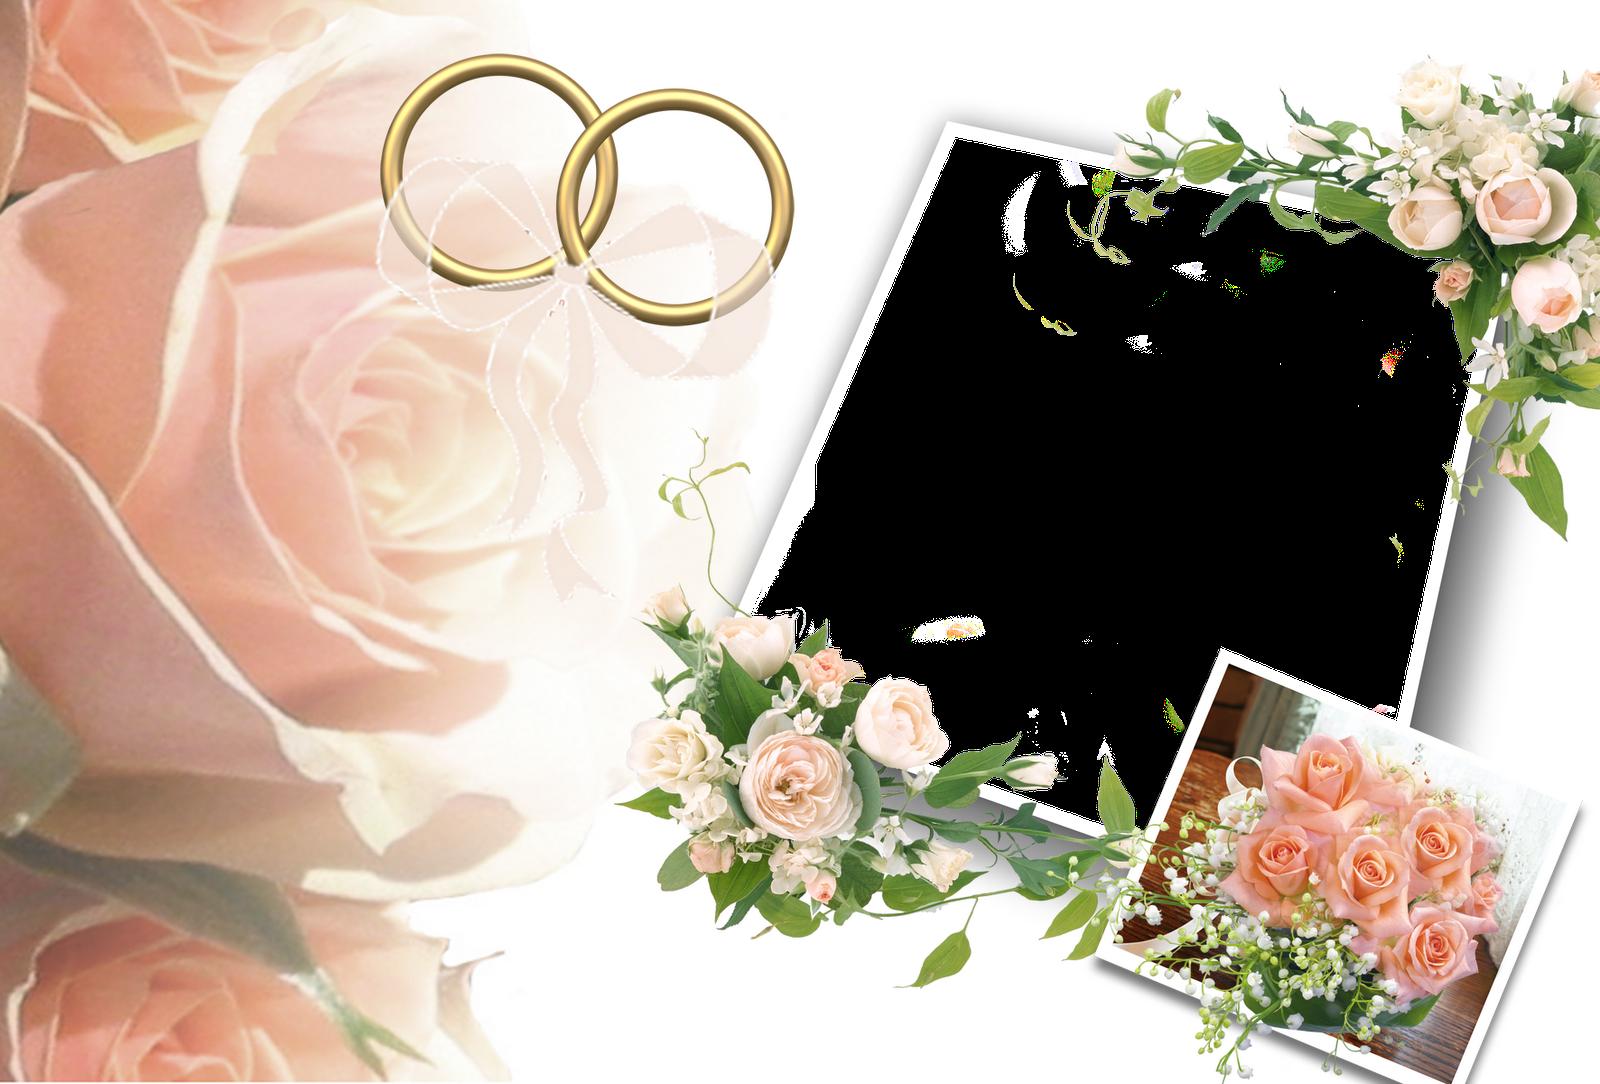 frames .png SYEDIMRAN Pernikahan, Dinding gambar, Gambar